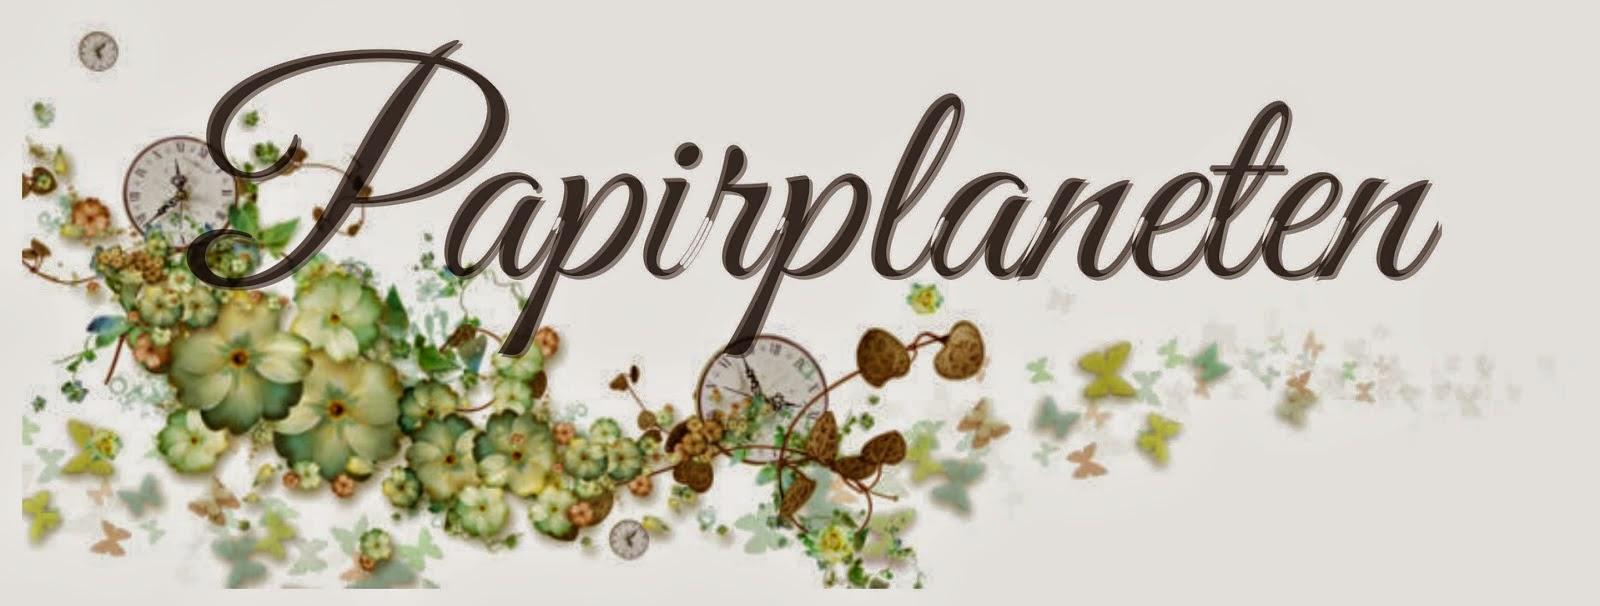 Papirplaneten